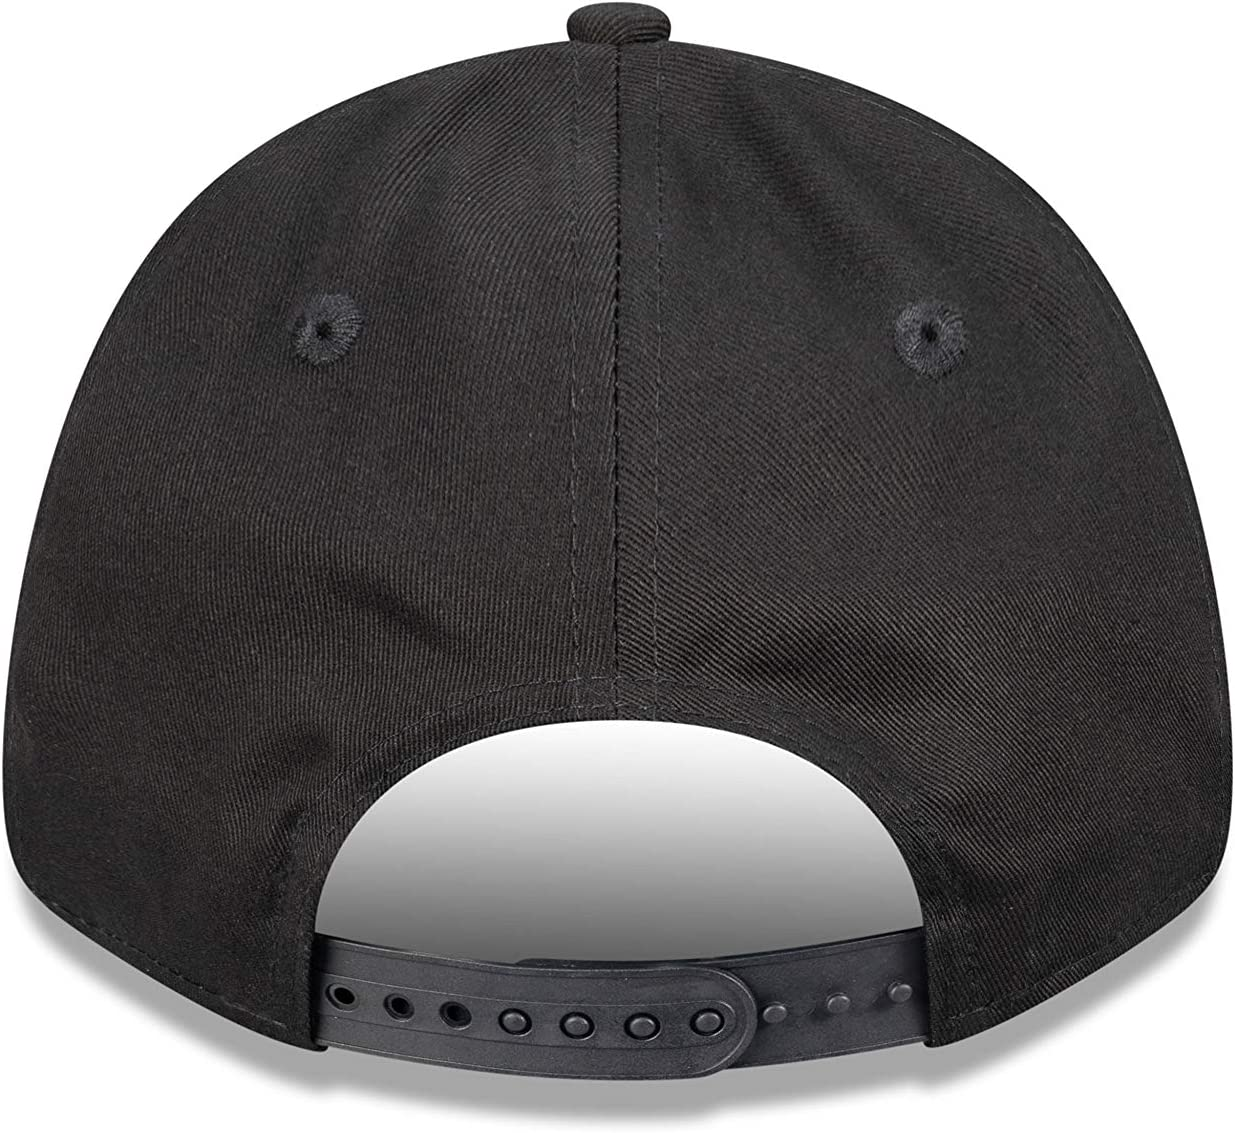 New Era NBA cap 9Forty adjustable baseball cap snapback hat basketball Bulls Lakers Celtics